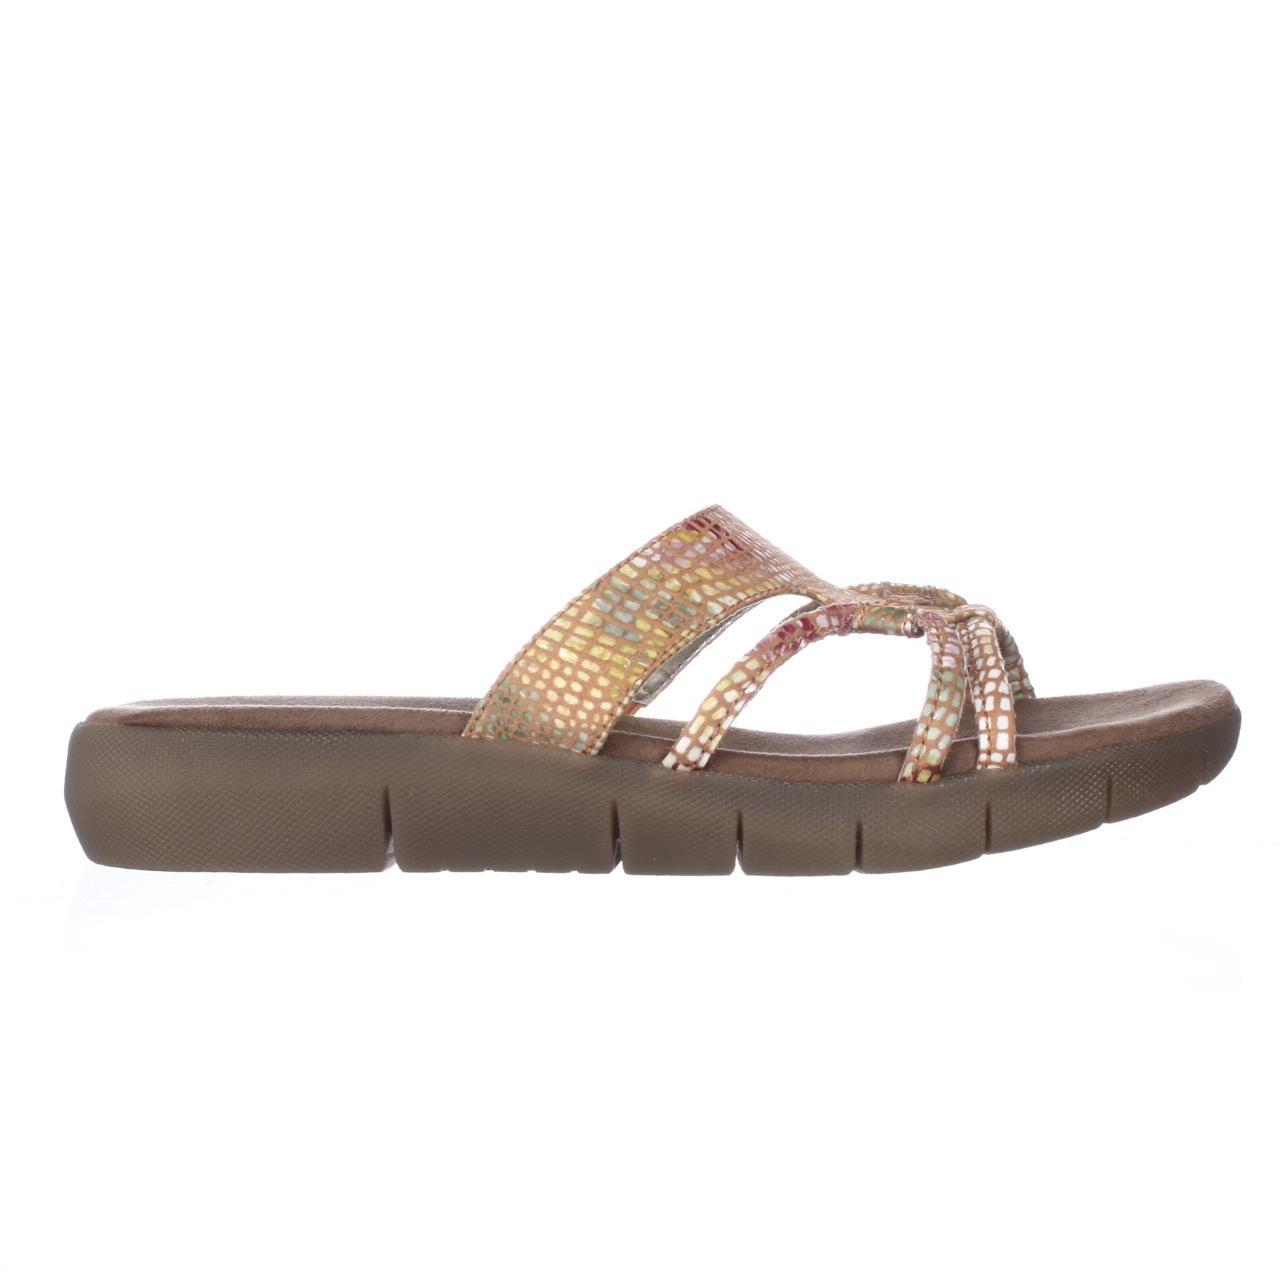 0232090f6f91 Lyst - Aerosoles Wip Away Comfort Slide Sandals in Brown